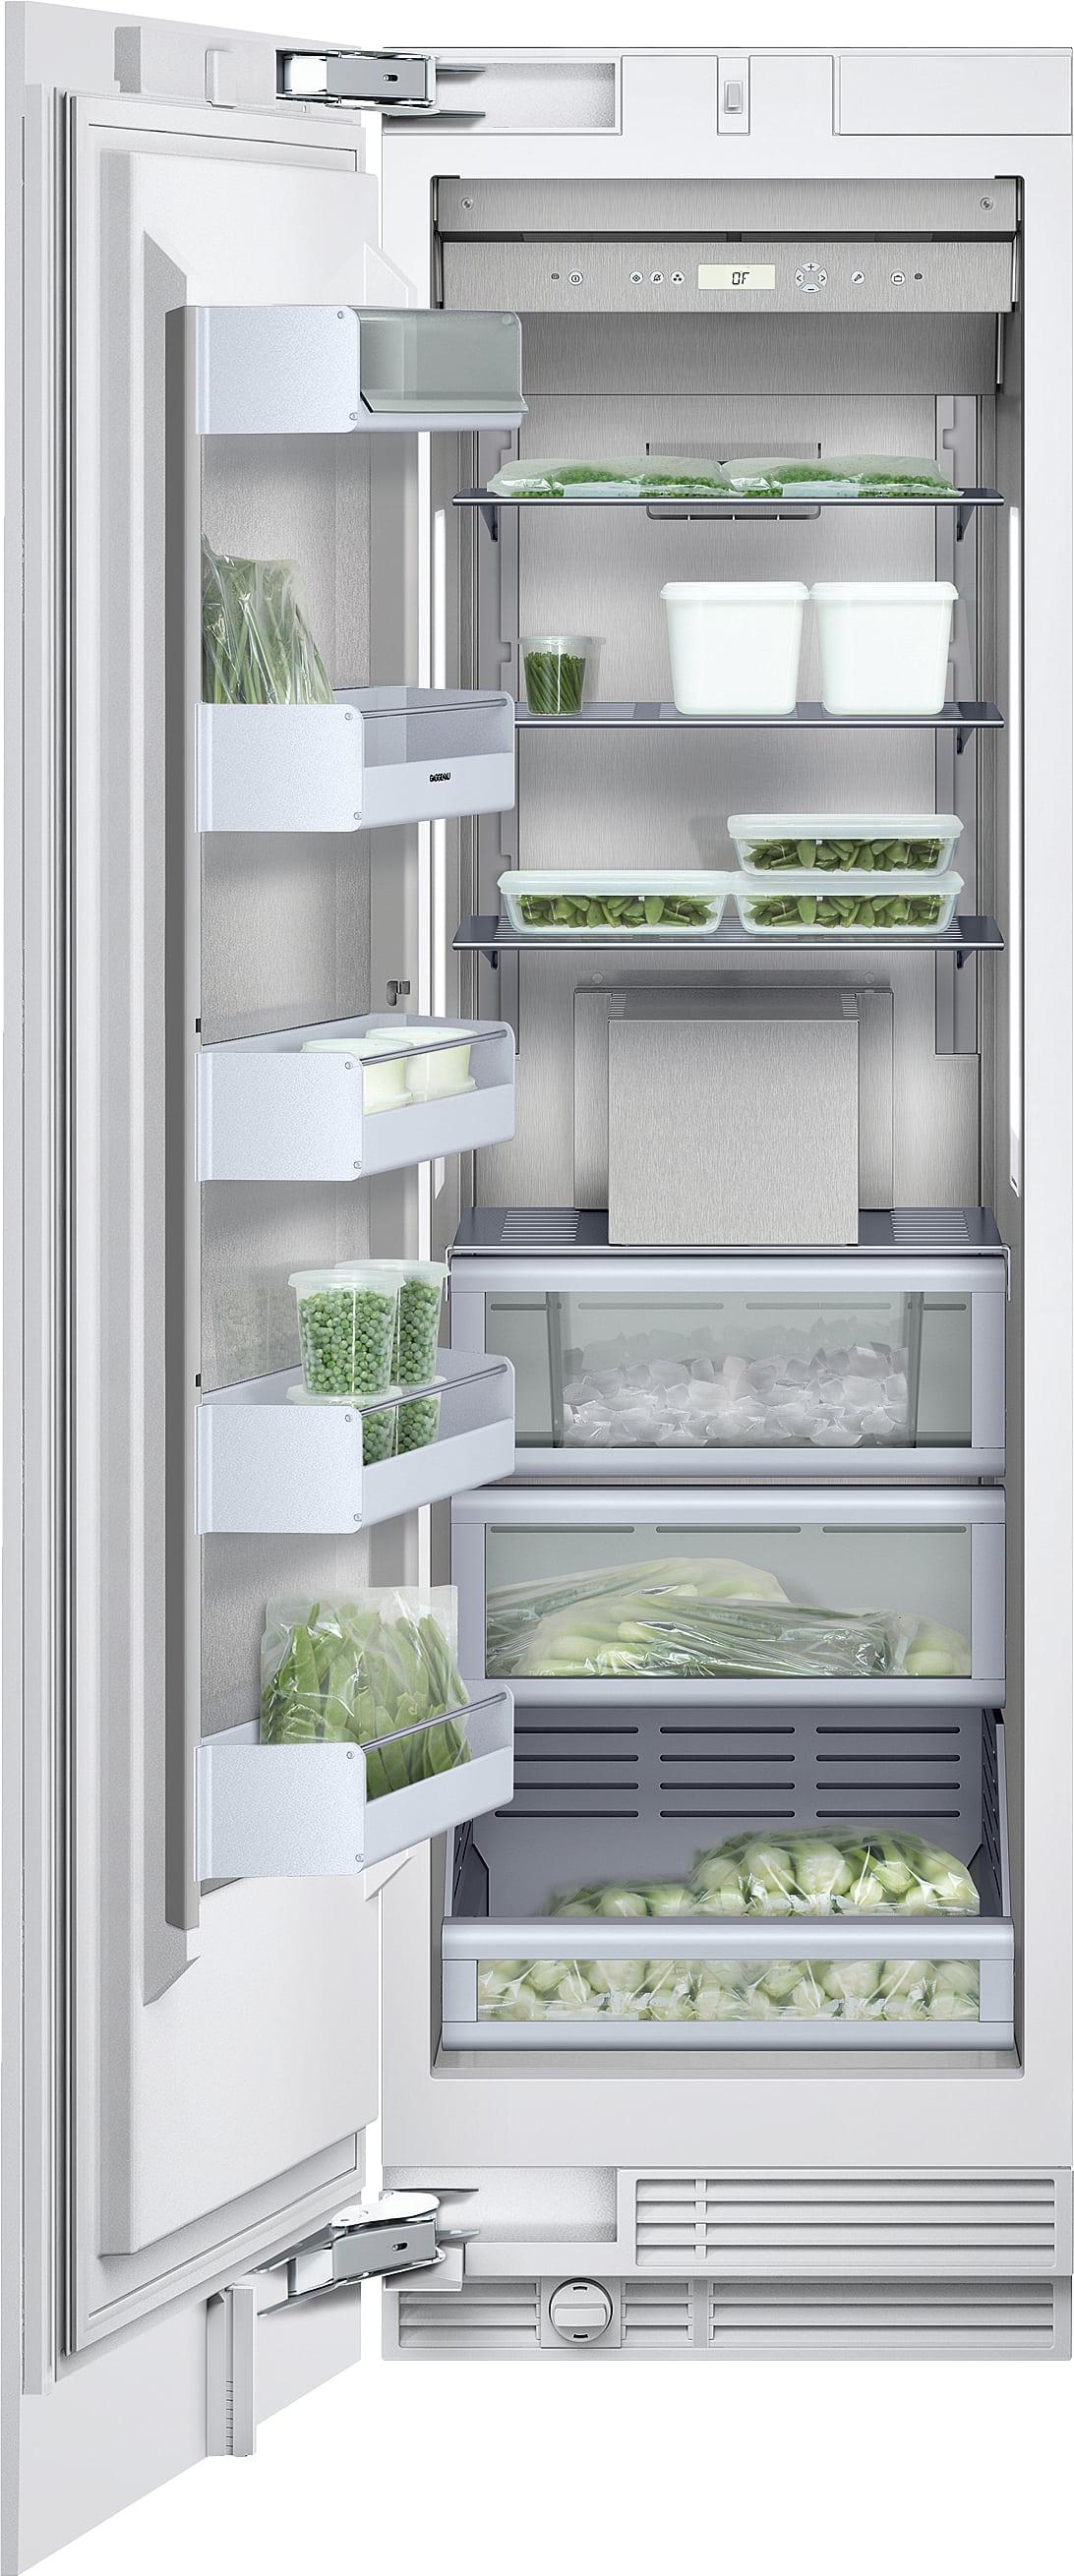 gaggenau rc472701 30 inch built in refrigerator column. Black Bedroom Furniture Sets. Home Design Ideas